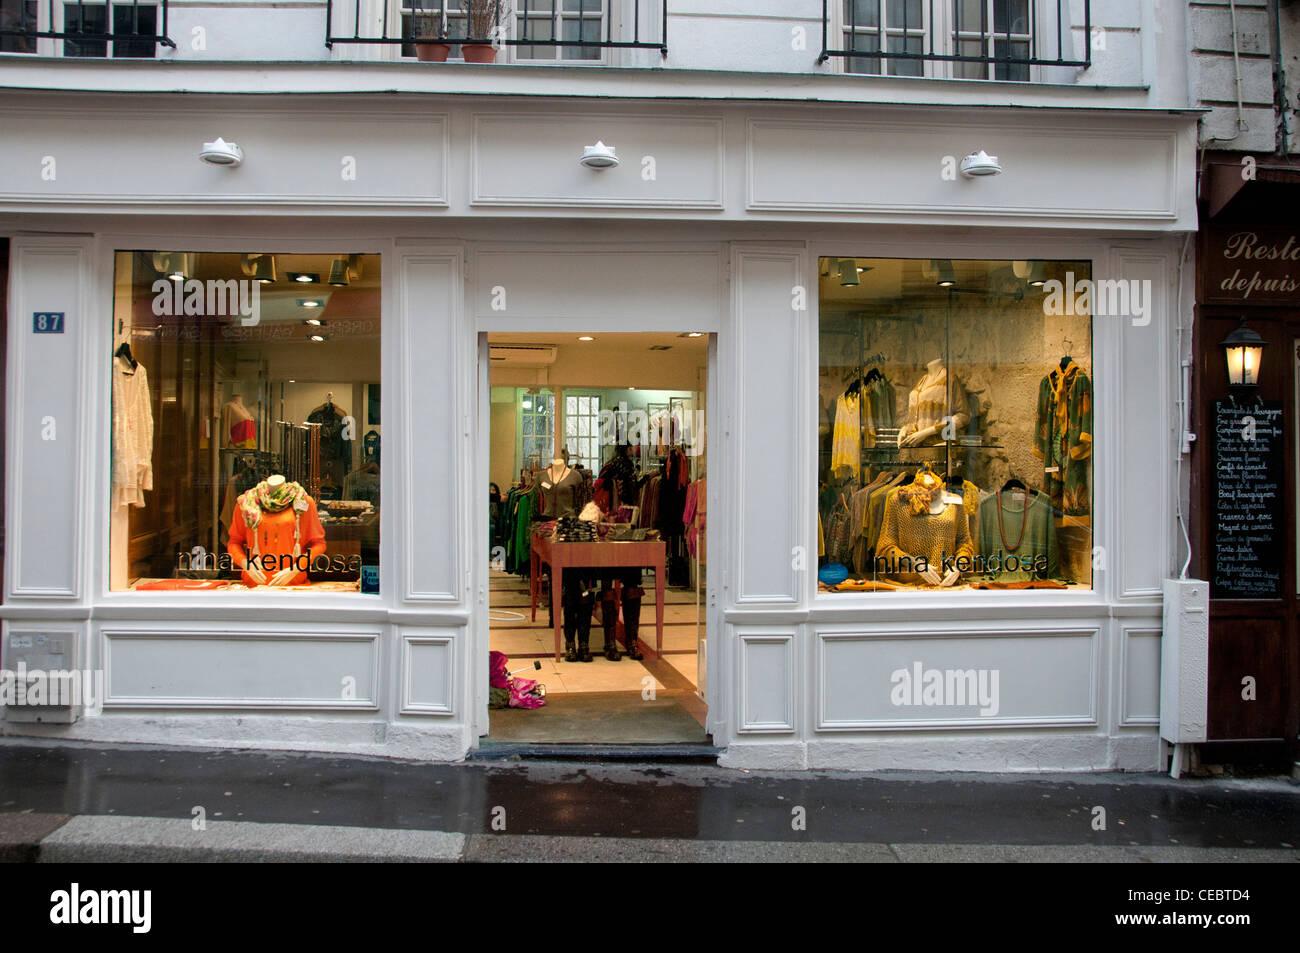 Nina Kendose Rue Mouffetard France Paris Fashion Mode Shop - Stock Image